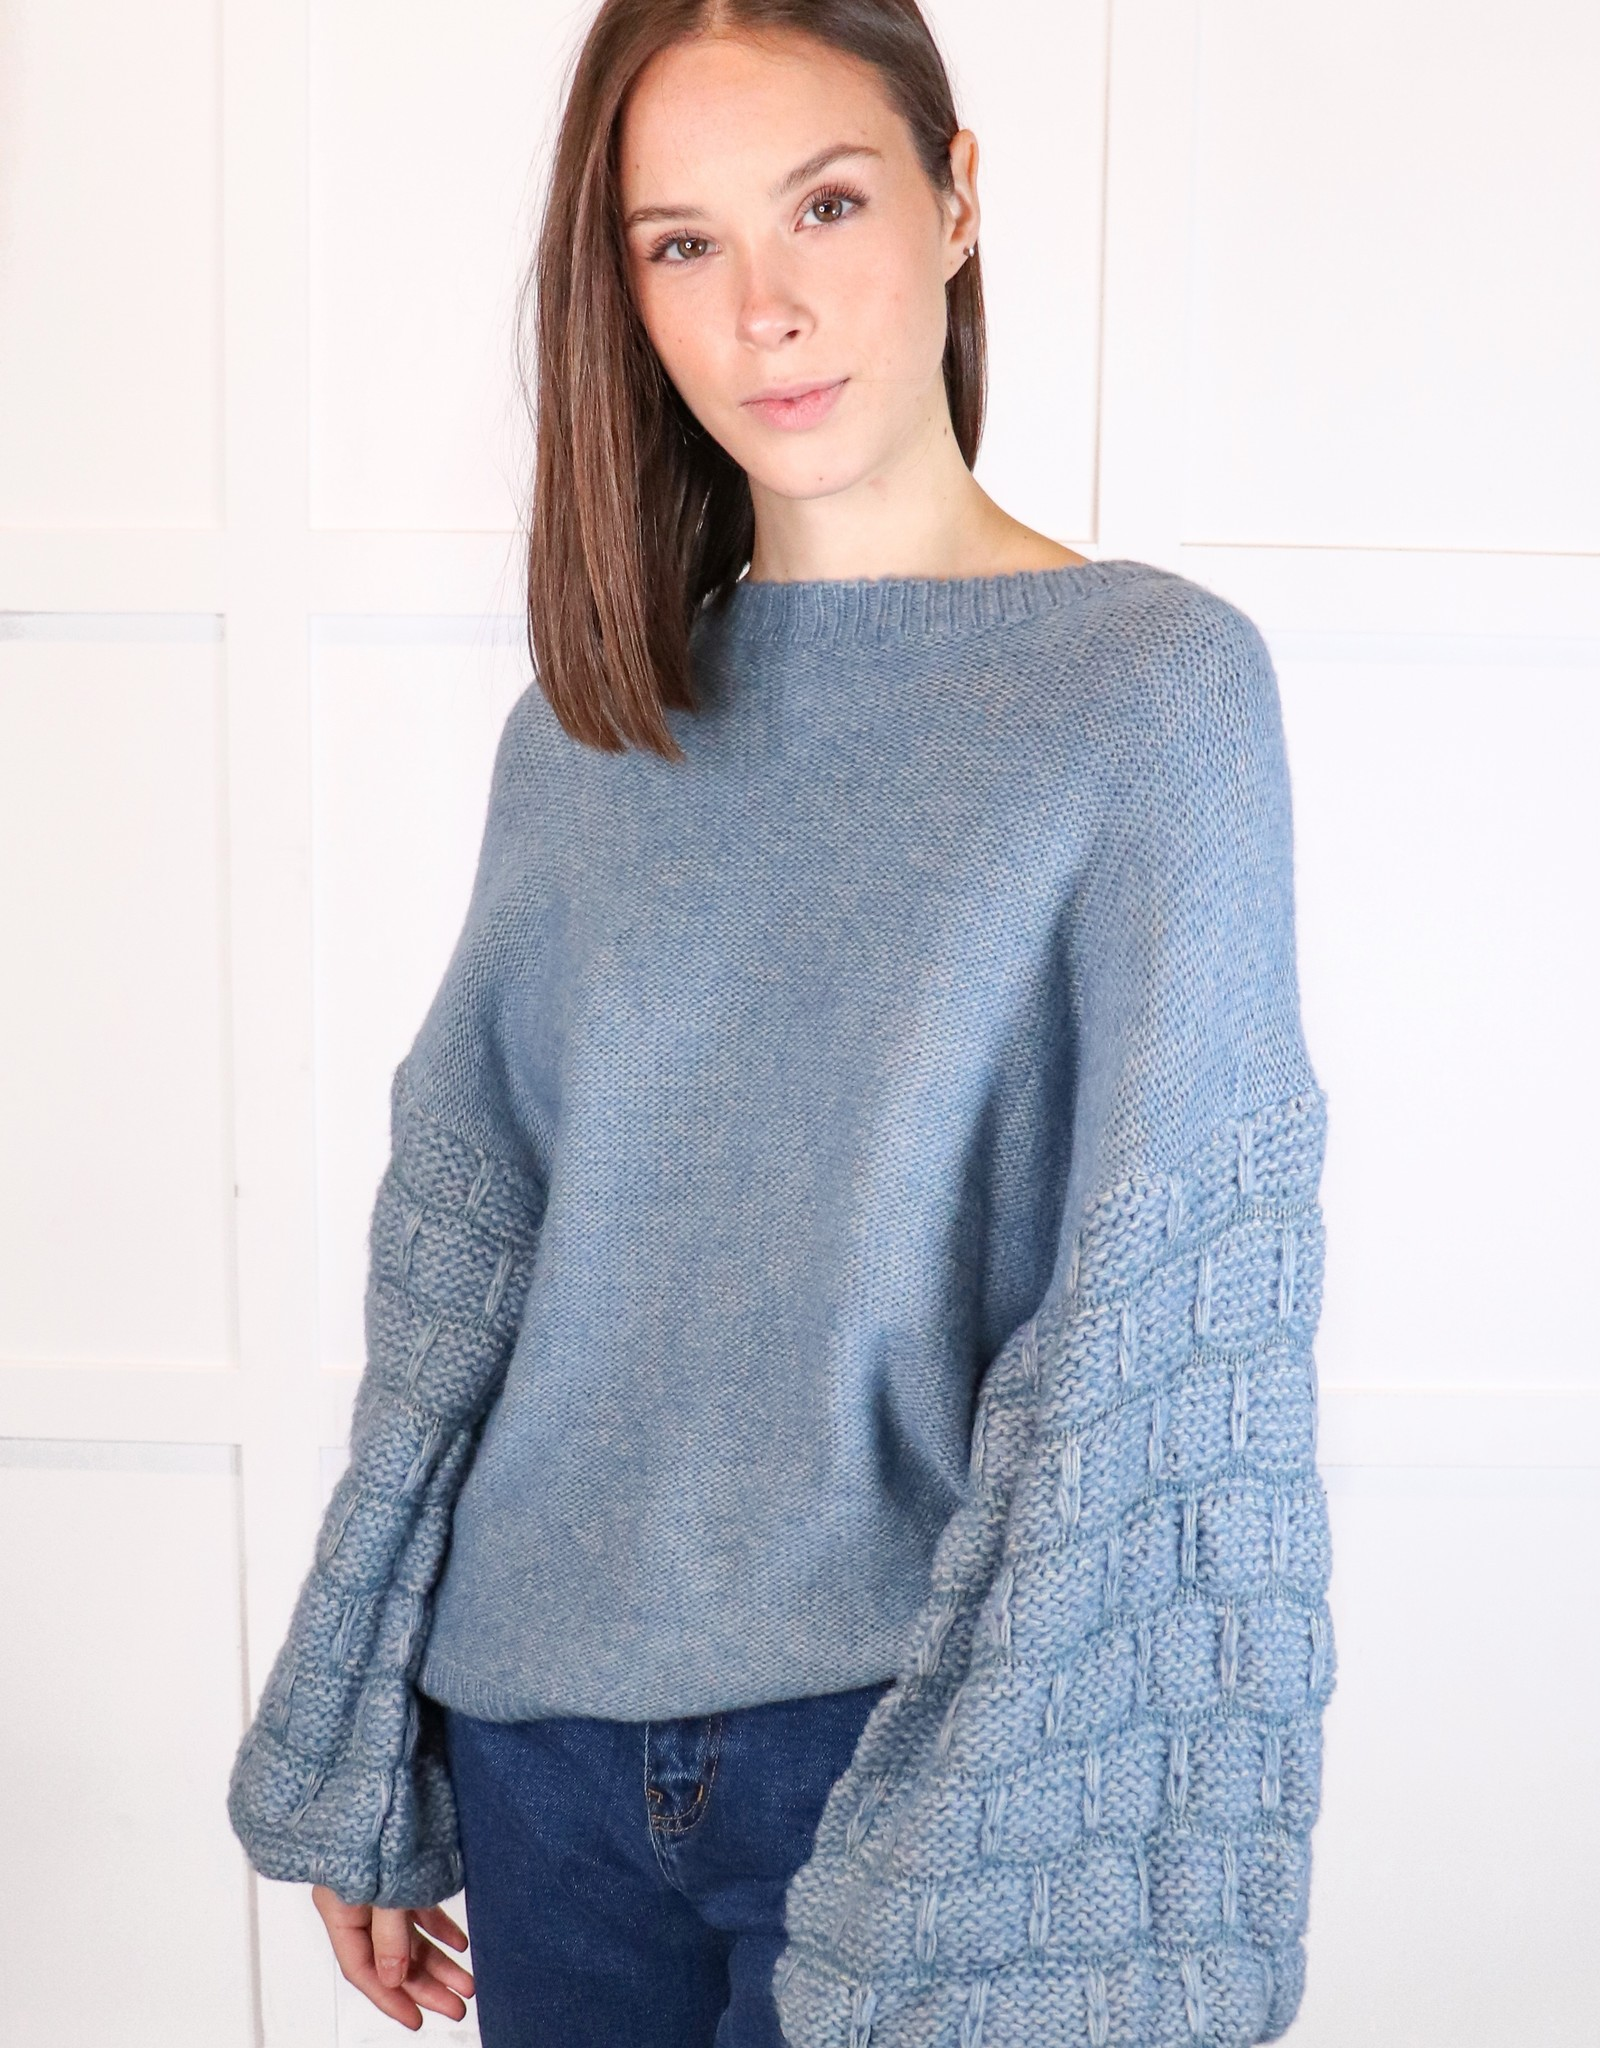 HUSH Baloon slv textured sweater